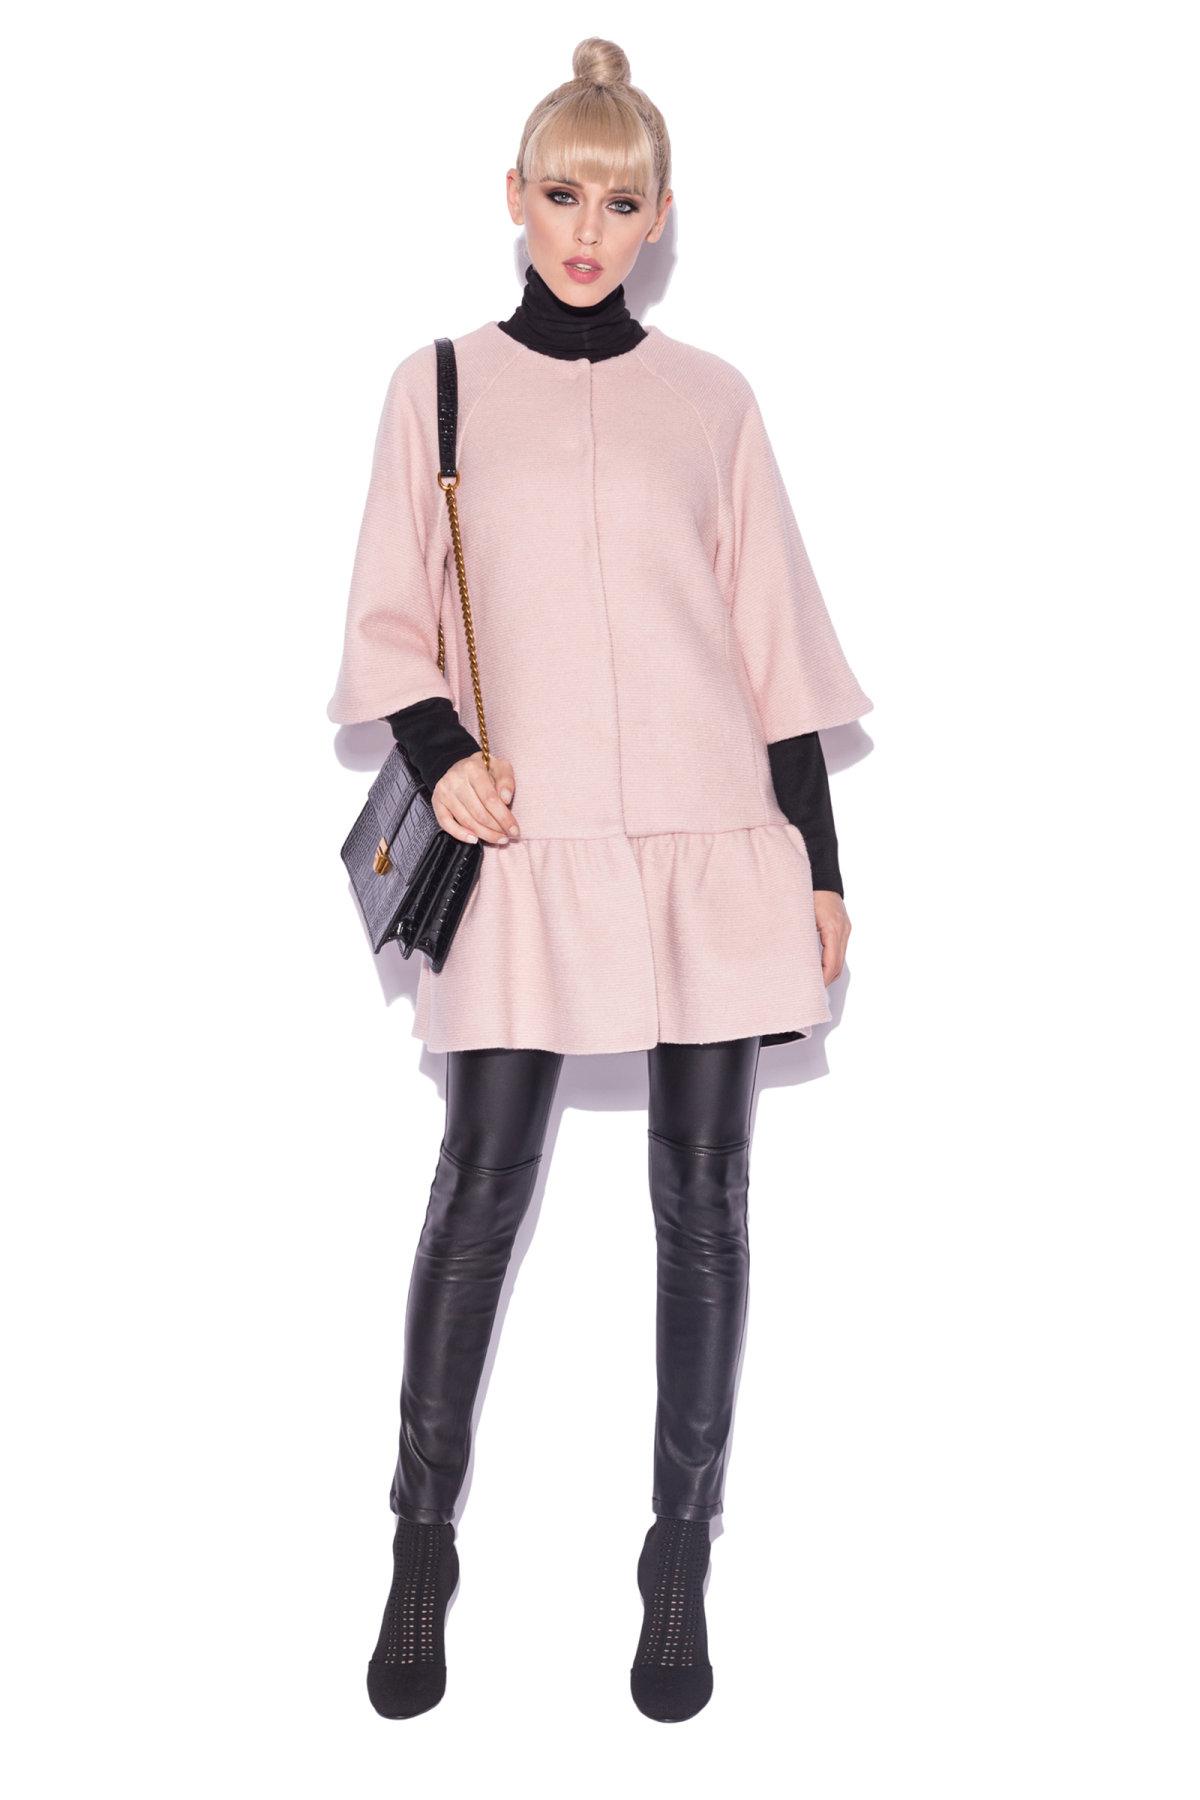 Palton elegant in culori contrastante Roz